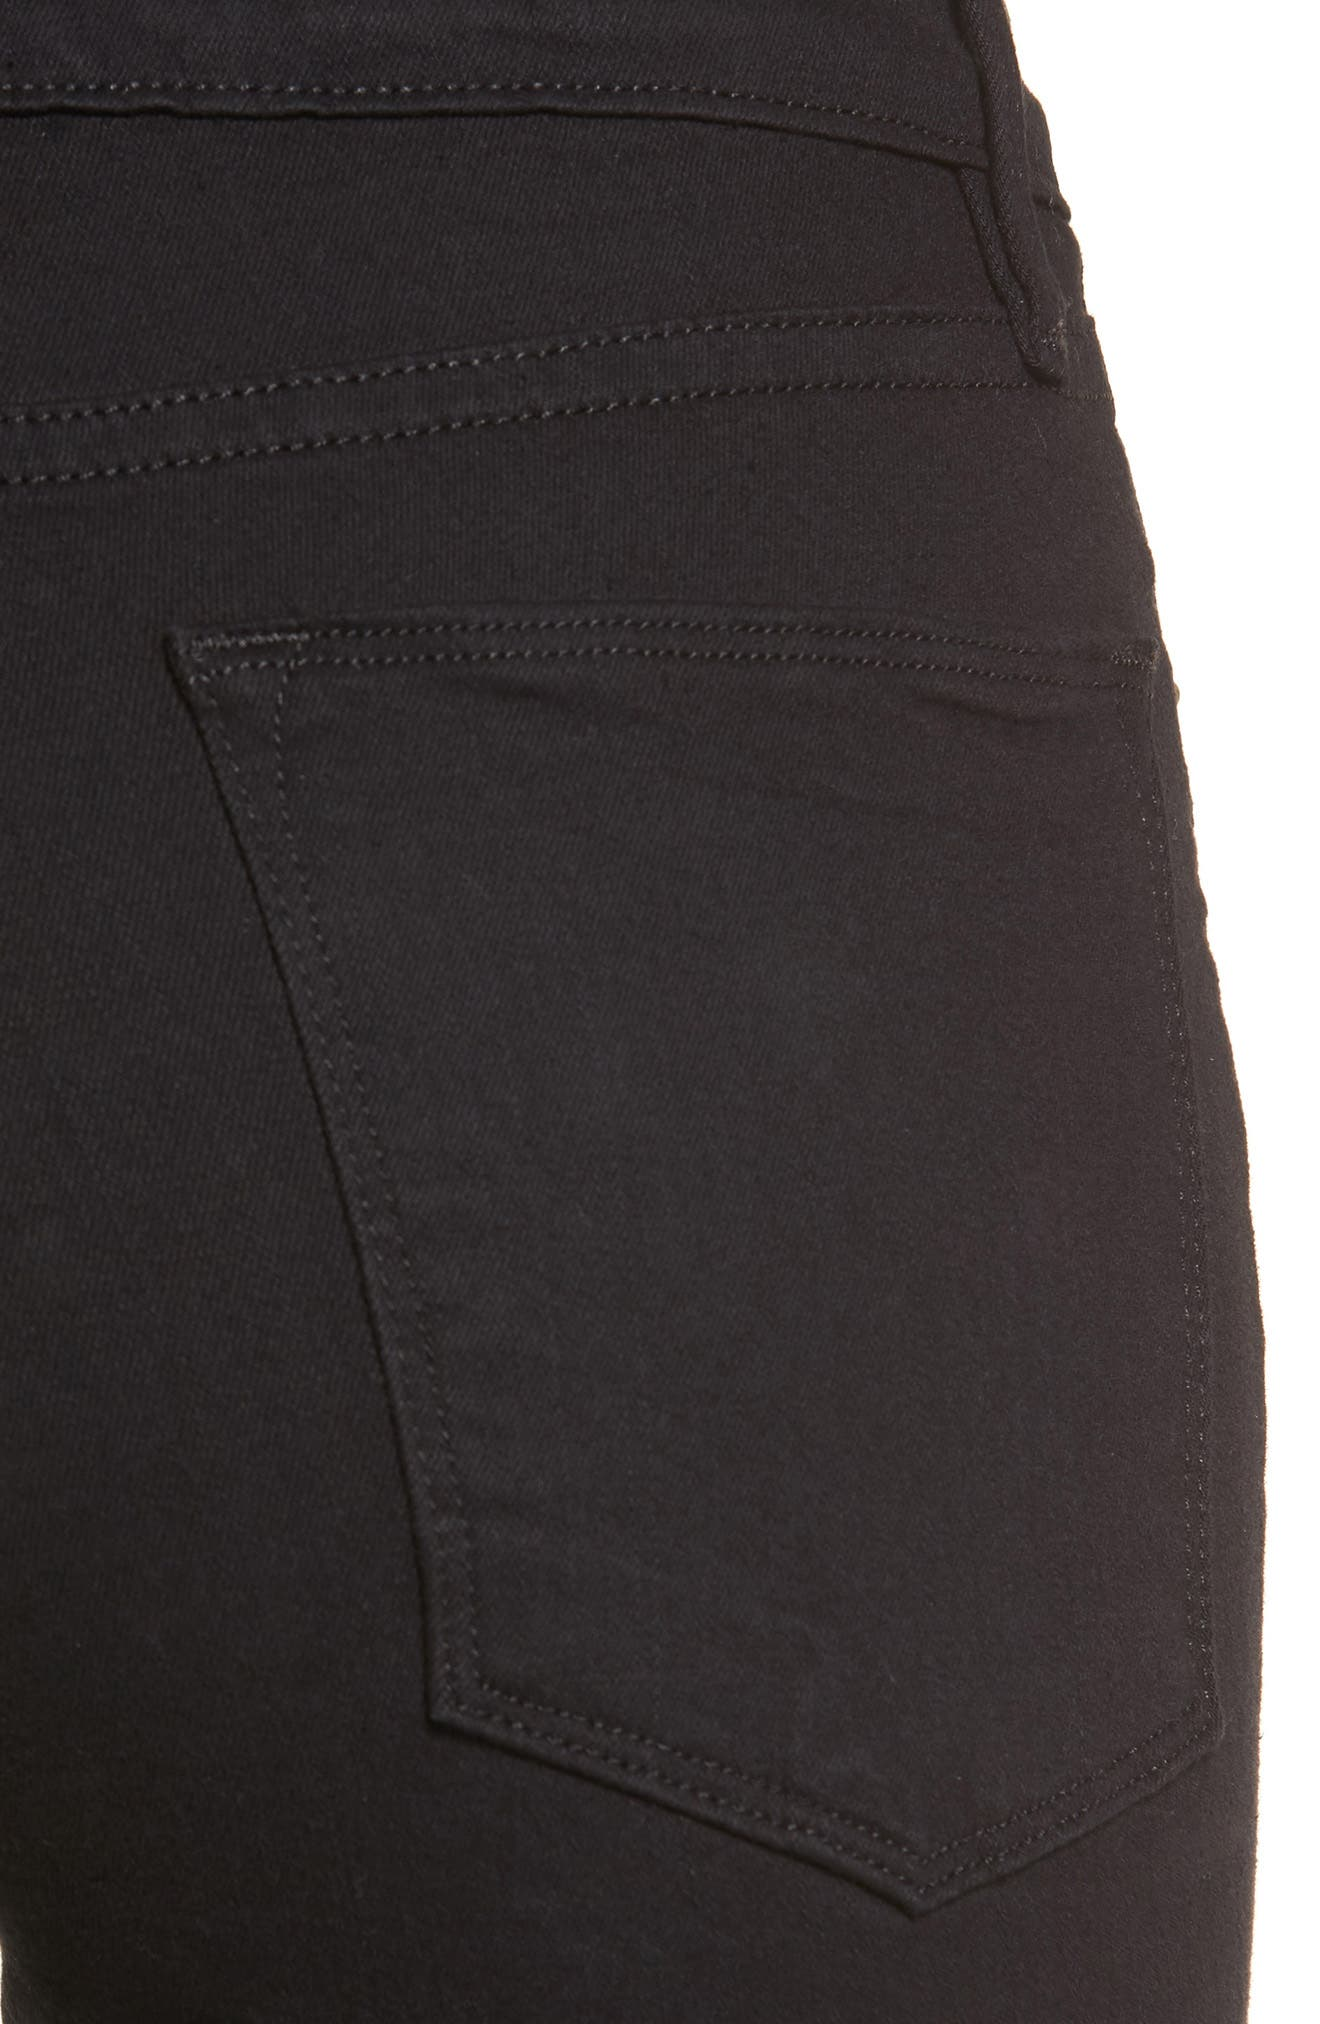 Le Color High Waist Skinny Jeans,                             Alternate thumbnail 4, color,                             003